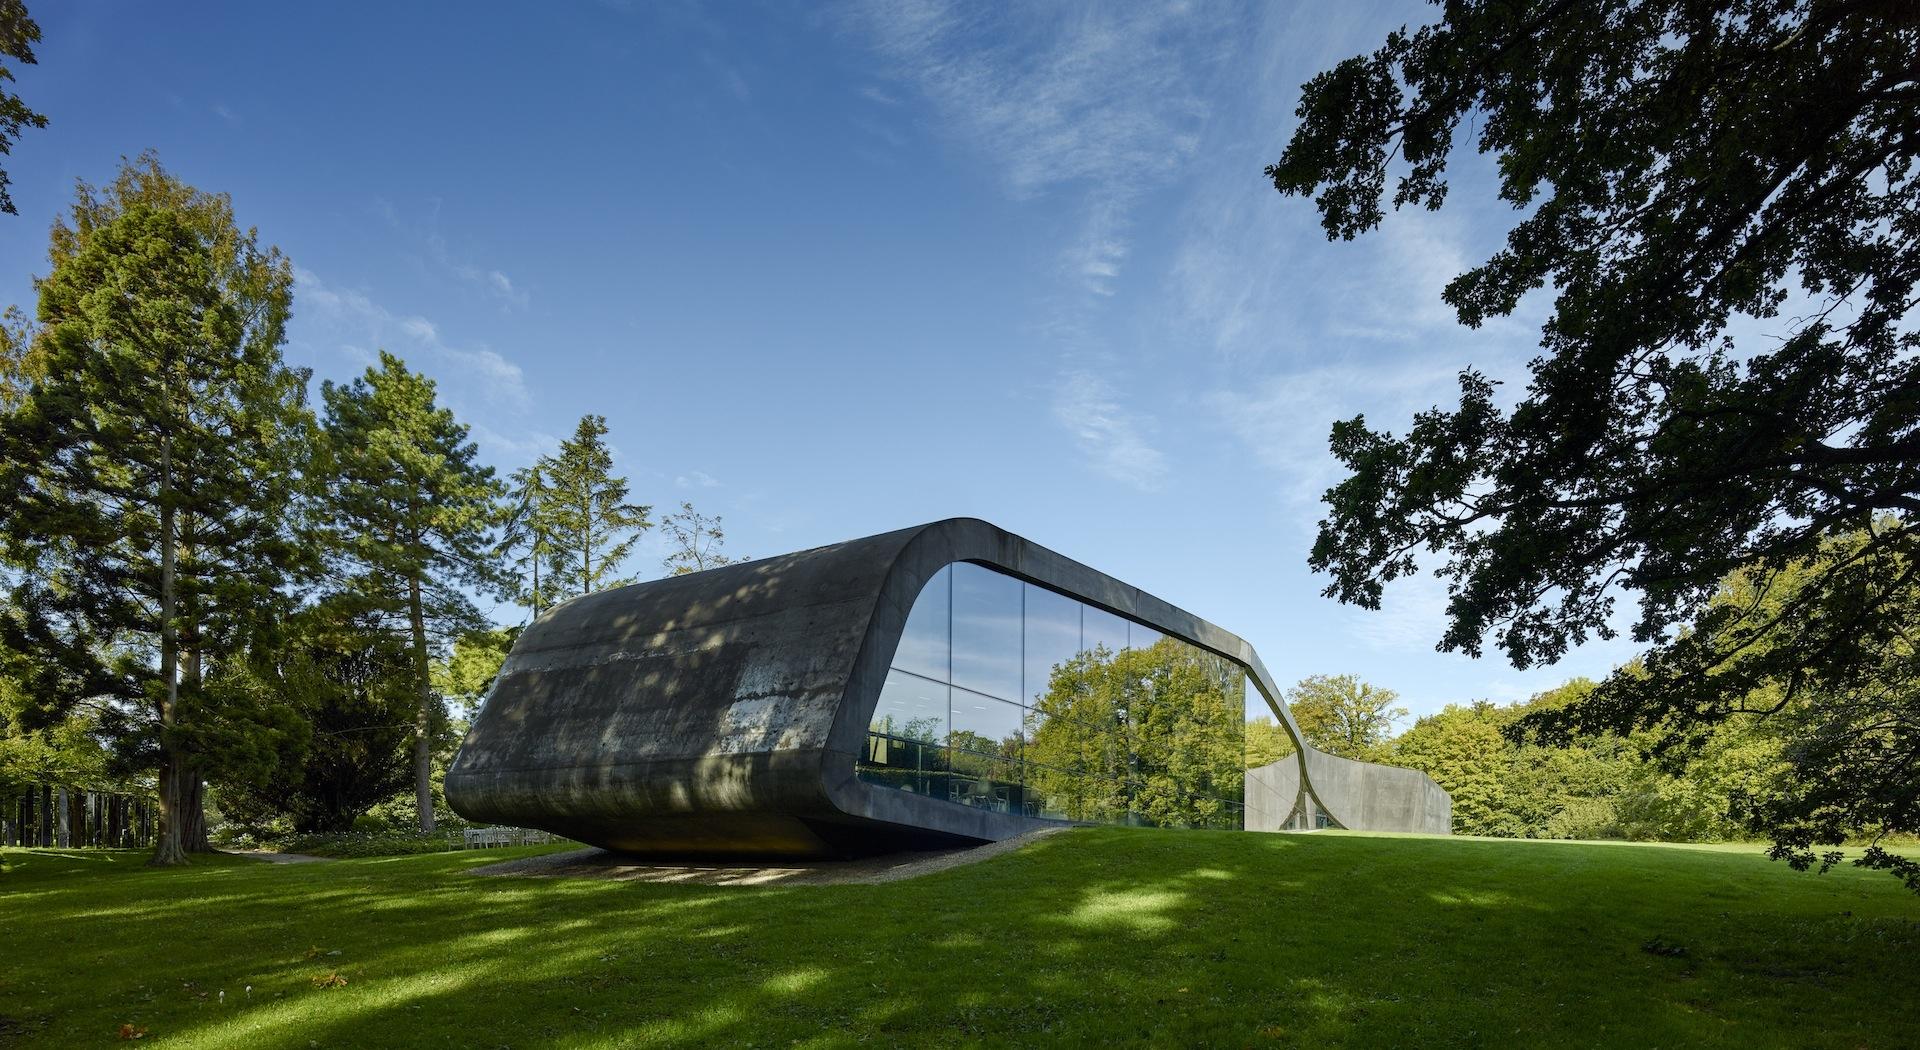 Las Mejores Obras De La Arquitecta Zaha Hadid Timberplan